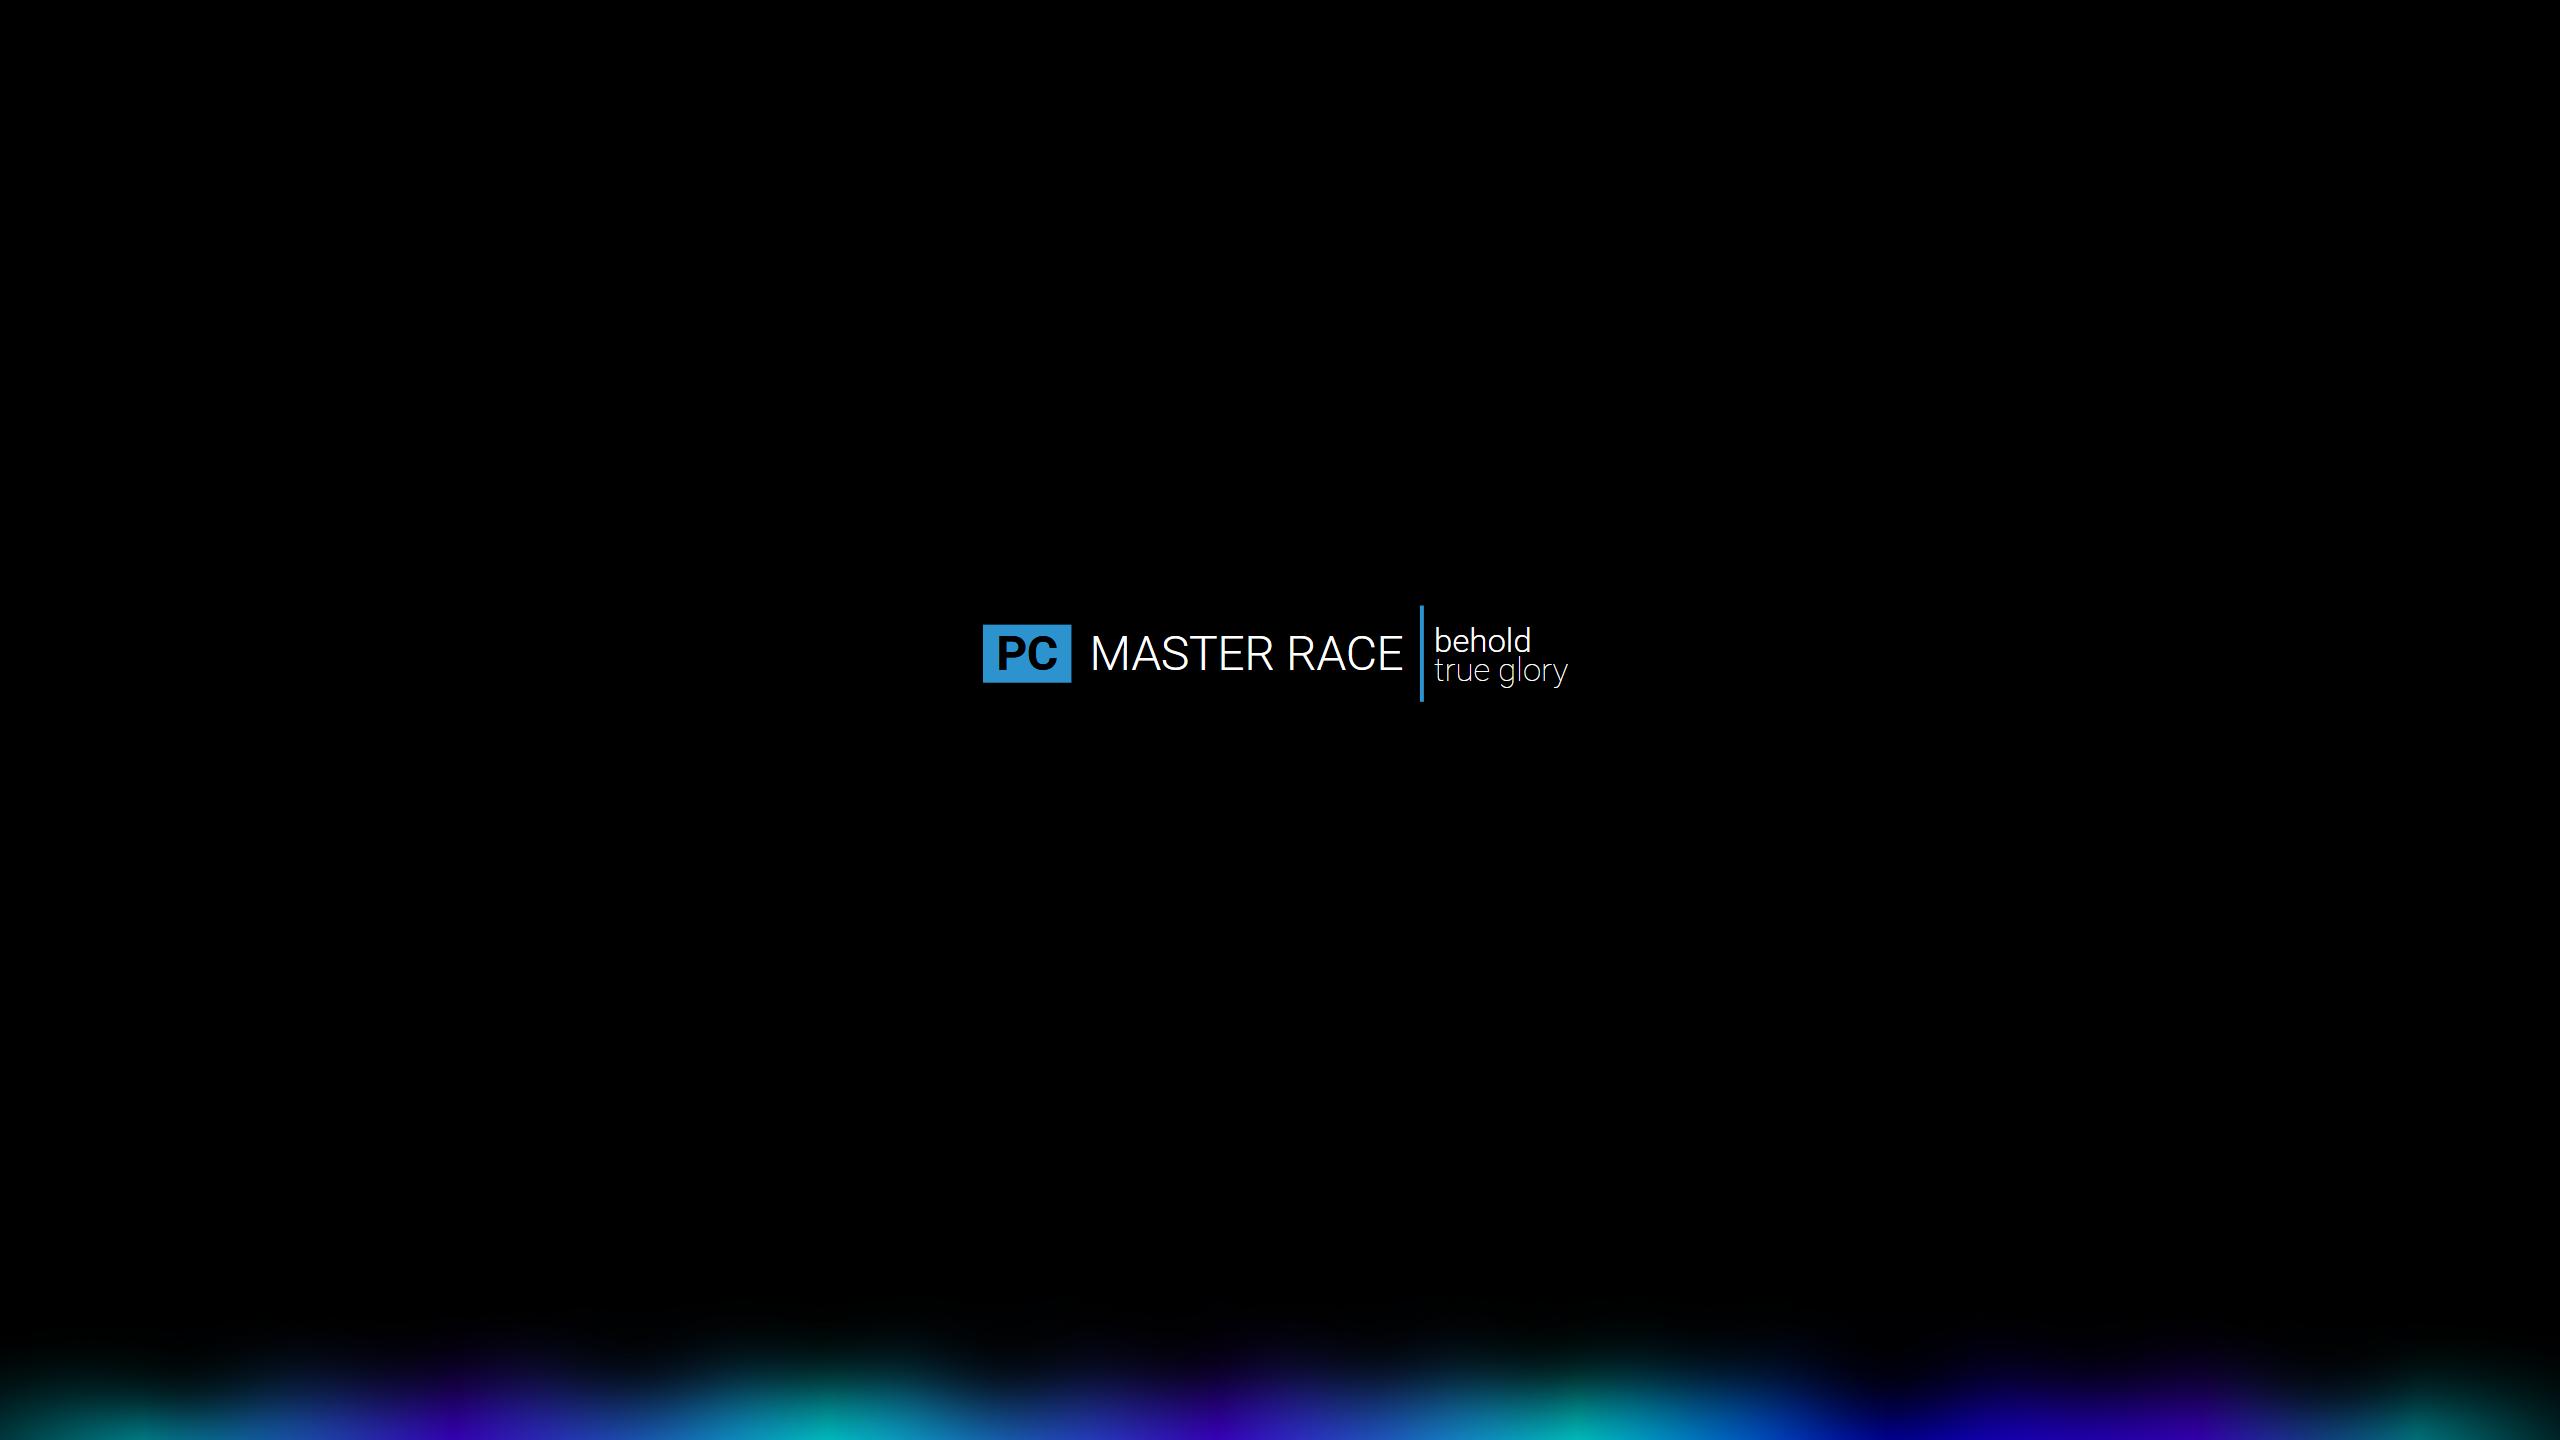 Wallpaper Pc Master Race Dark 2560x1440 Blazbluegirl